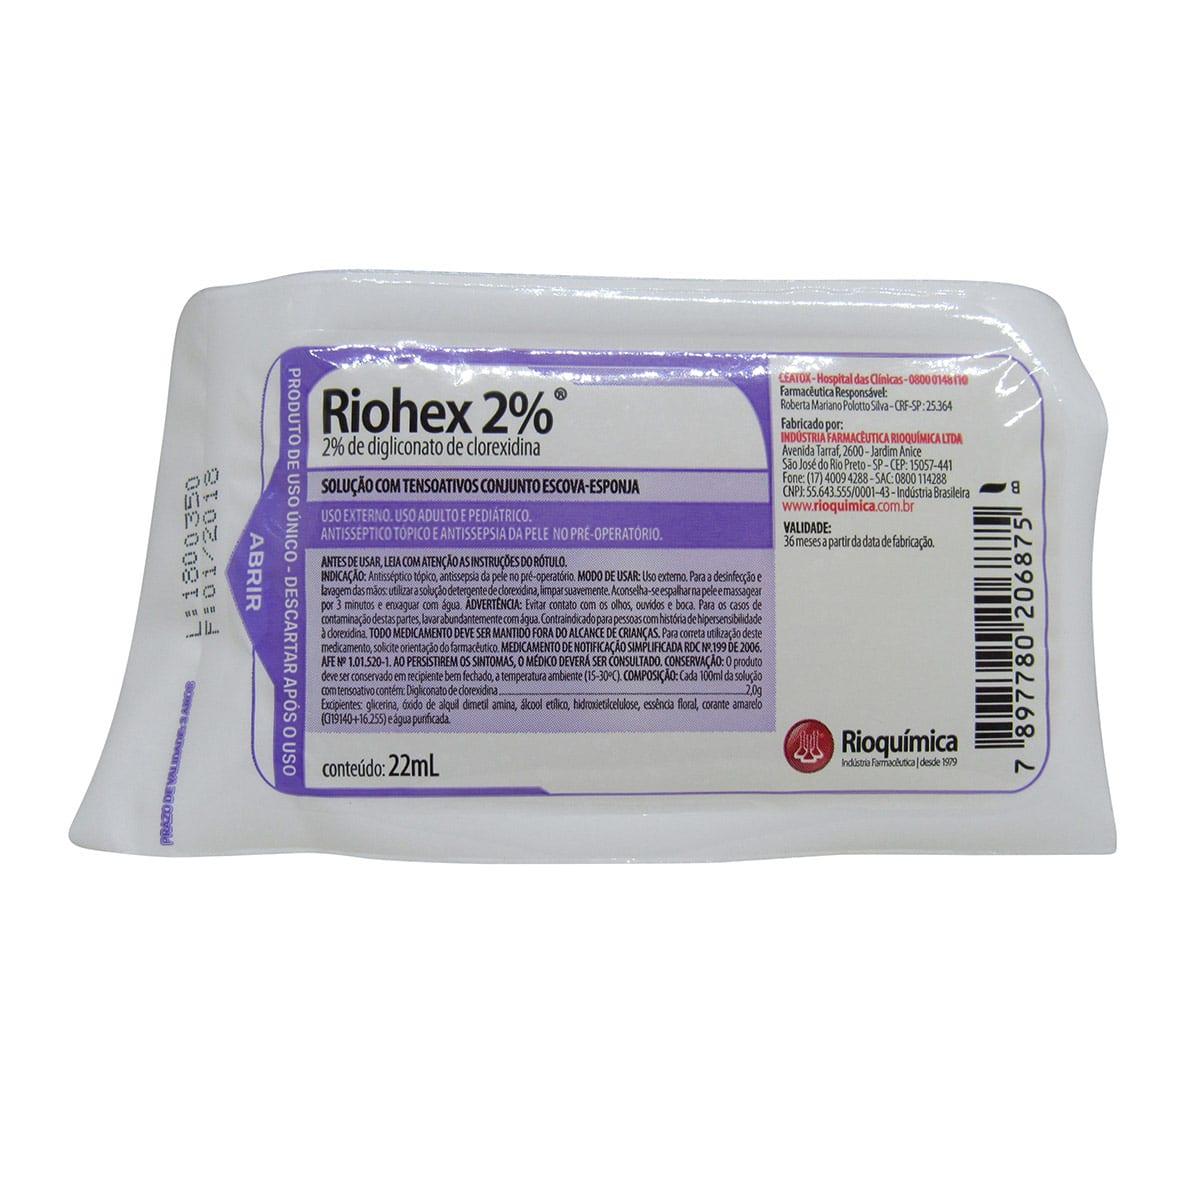 Escova Assepsia Riohex Clorexidina 2% Rioquímica Kit 10 un